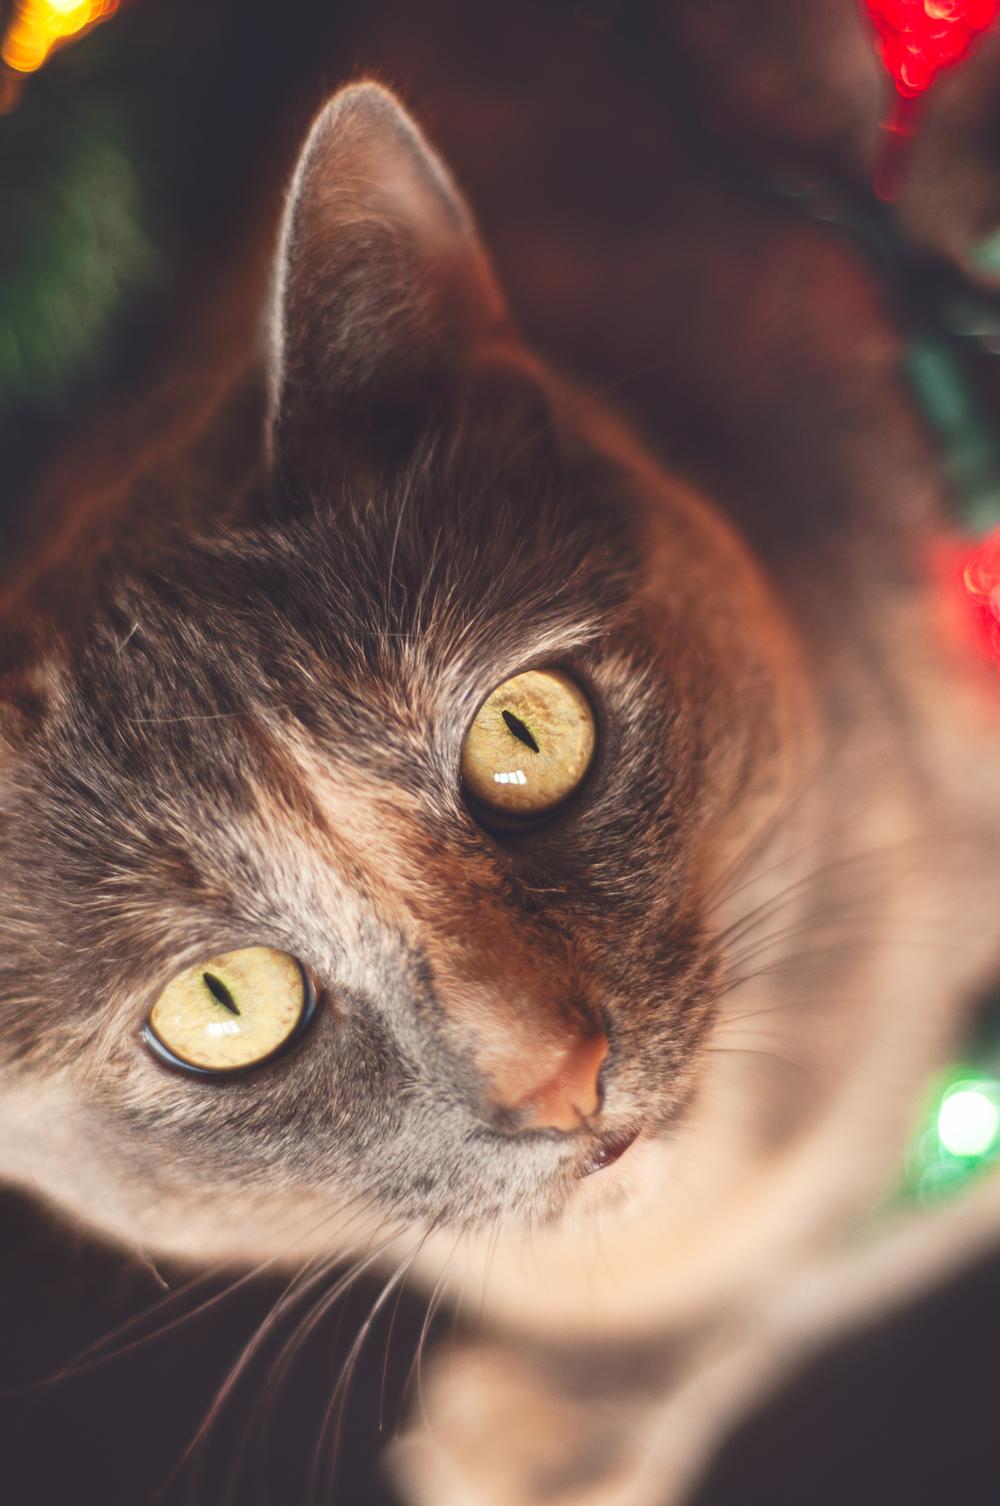 pet-photography-studio-natural-light-lifestyle-cat-closeup-holiday-long-island-photographer-digital.jpg